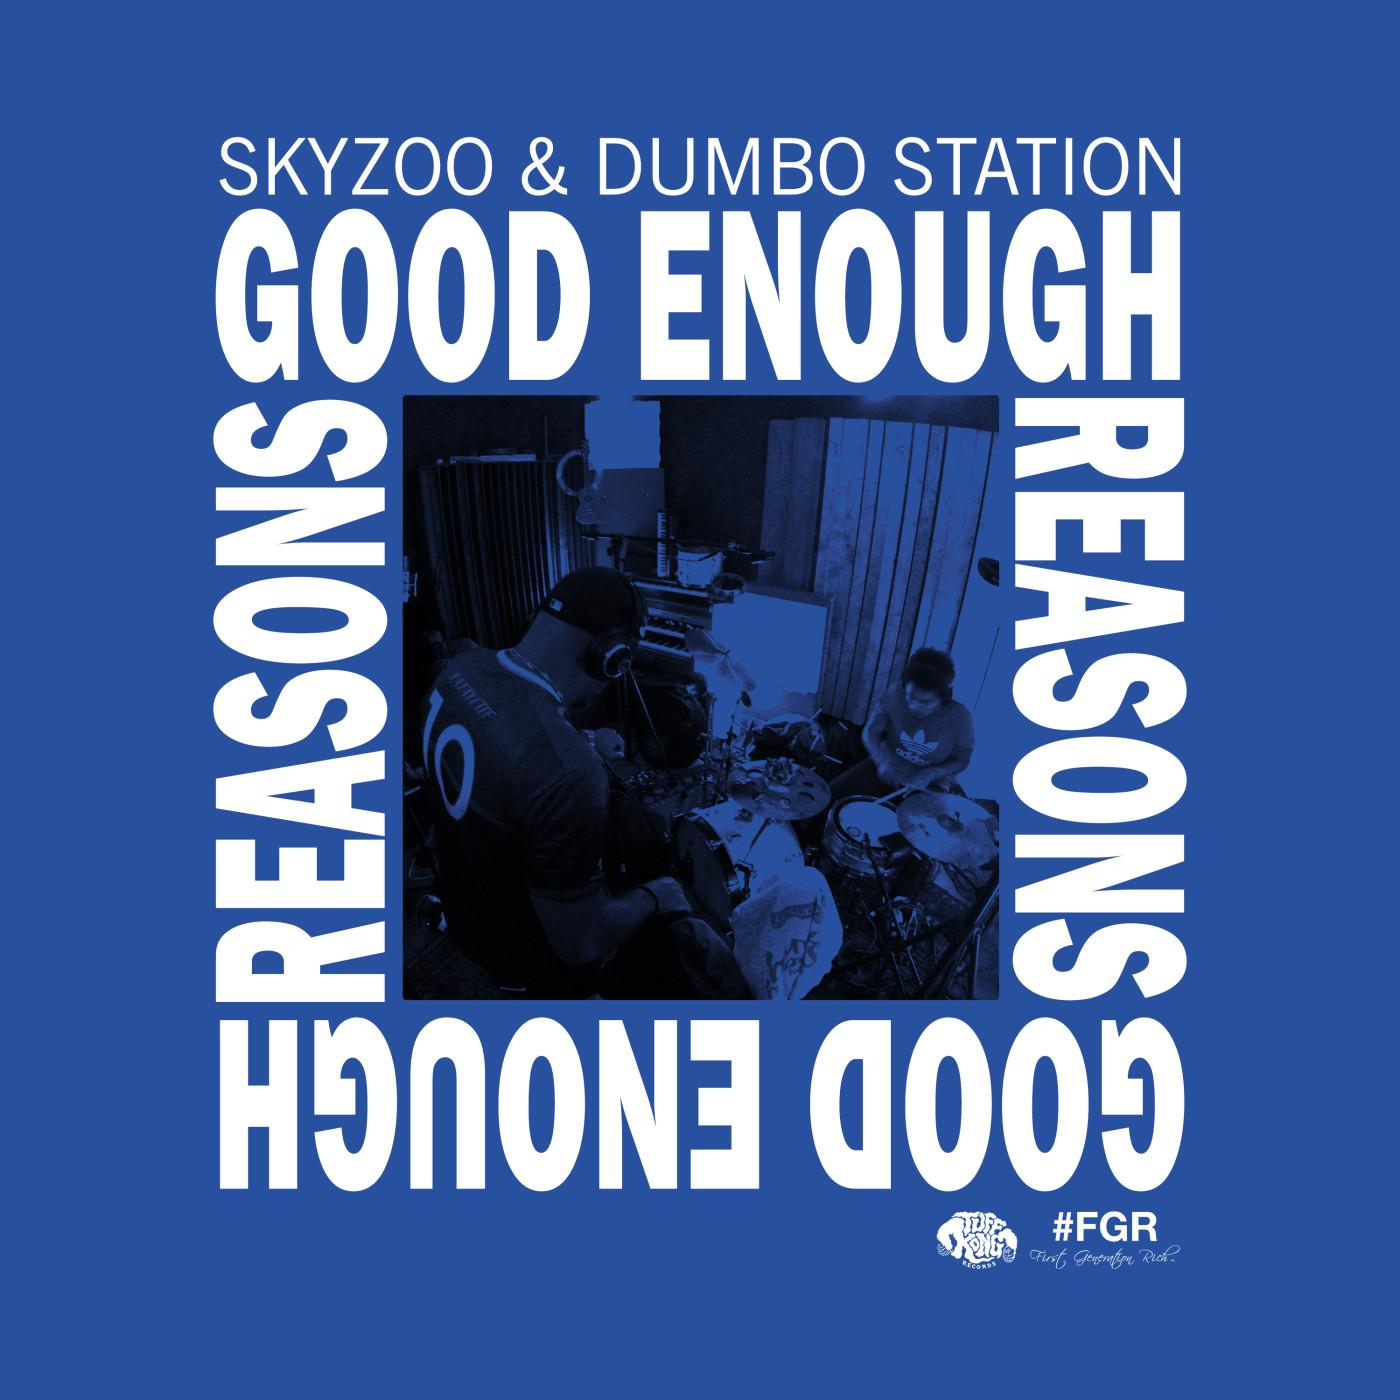 Skyzoo Good Enough Reasons